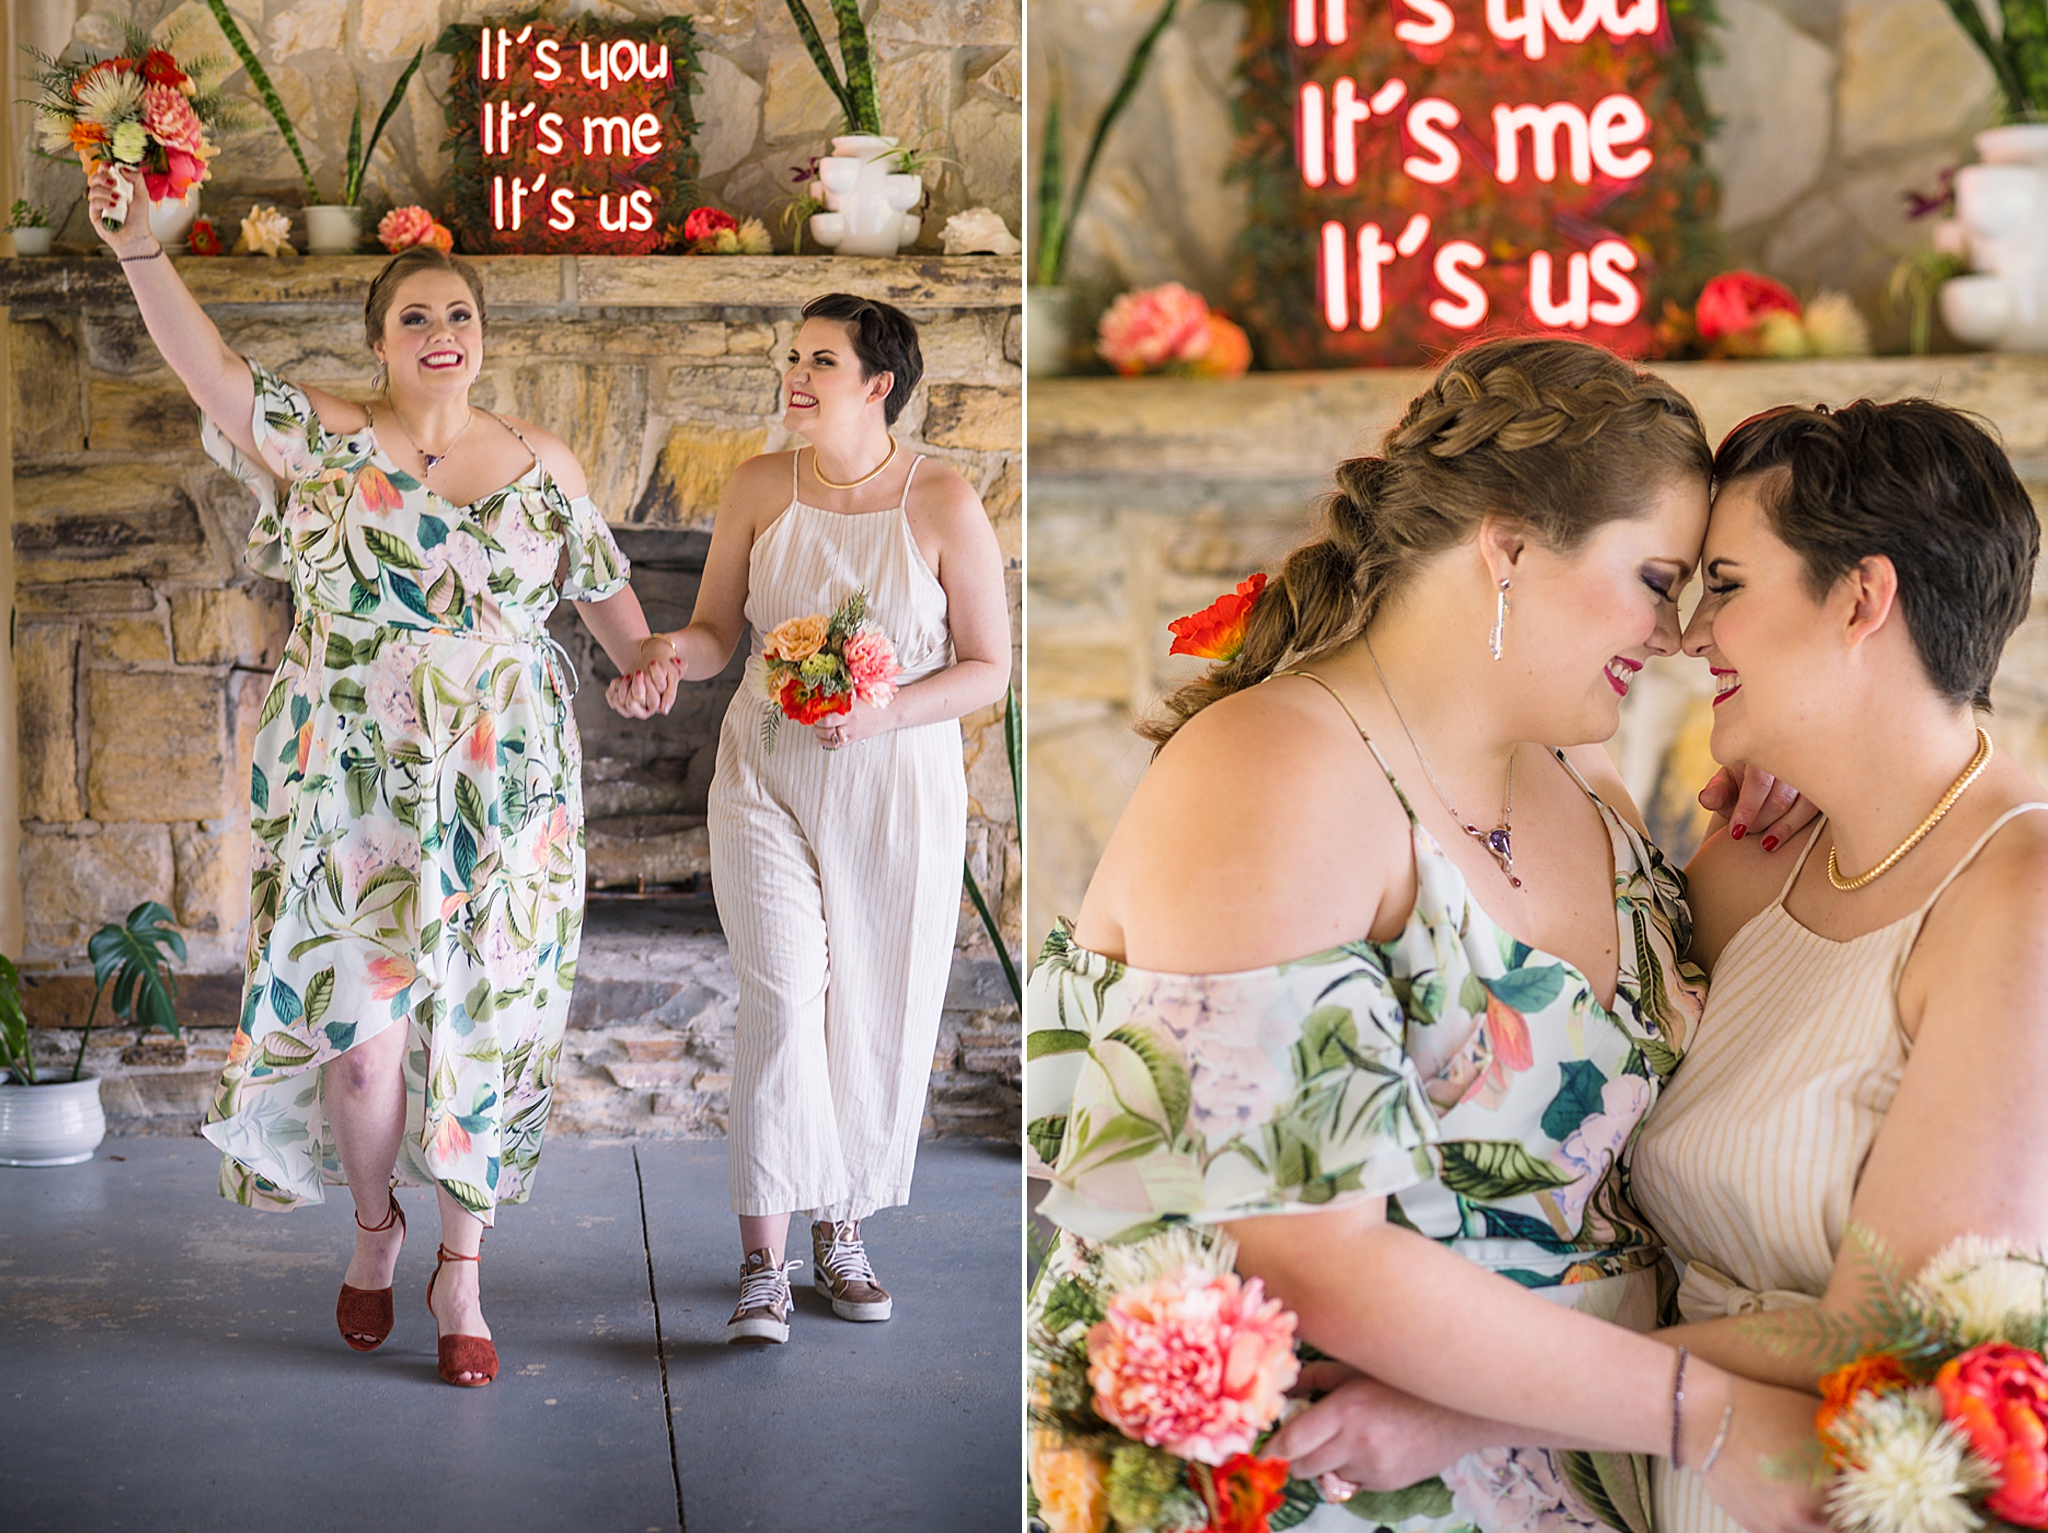 brides cheer after ceremony at Bill Scott Pavilion